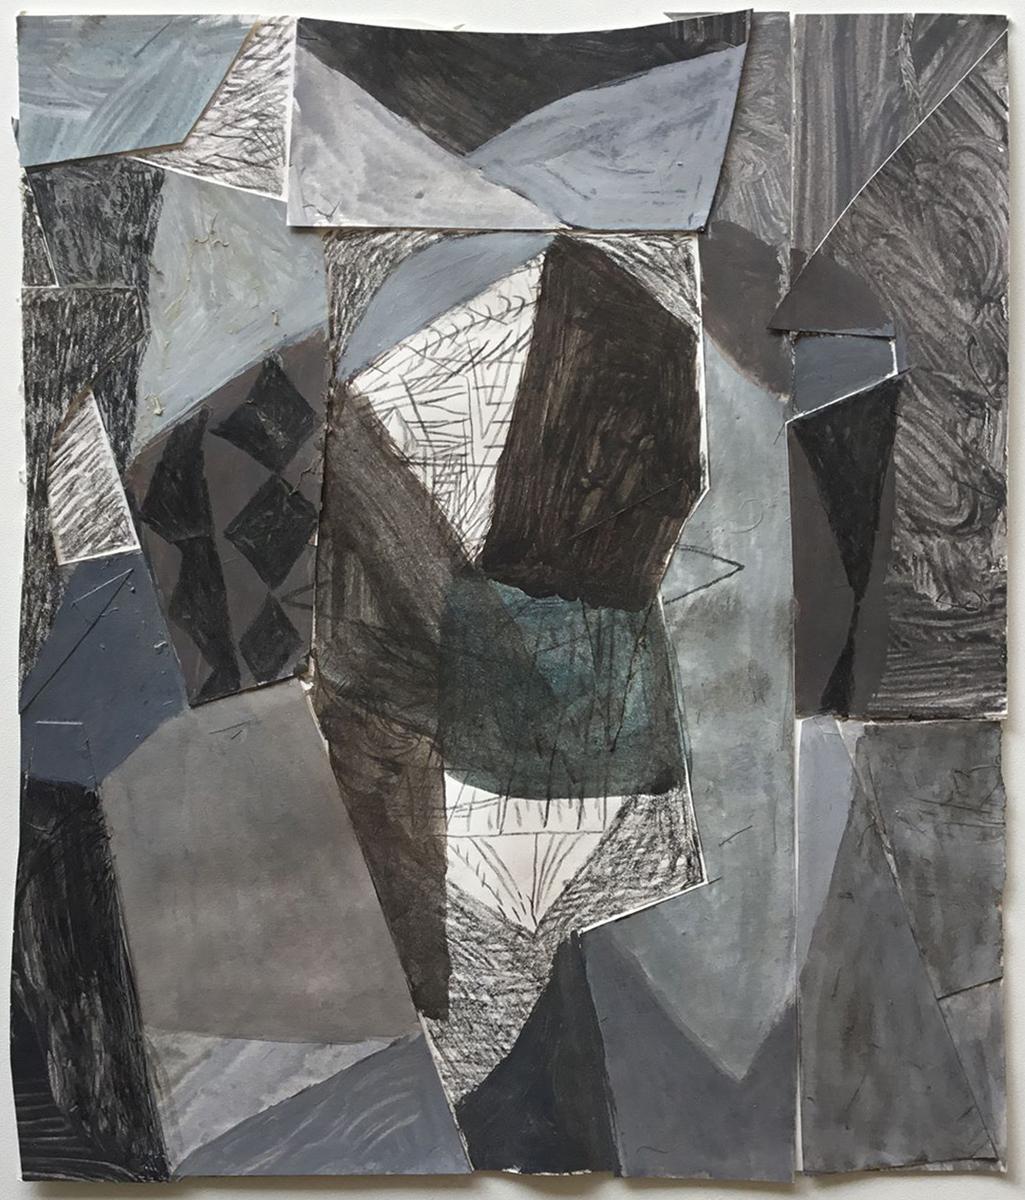 Carl Johan Sennels | Flux #5, 2012. Watercolor, acrylic and pencil on paper, 25x21 cm